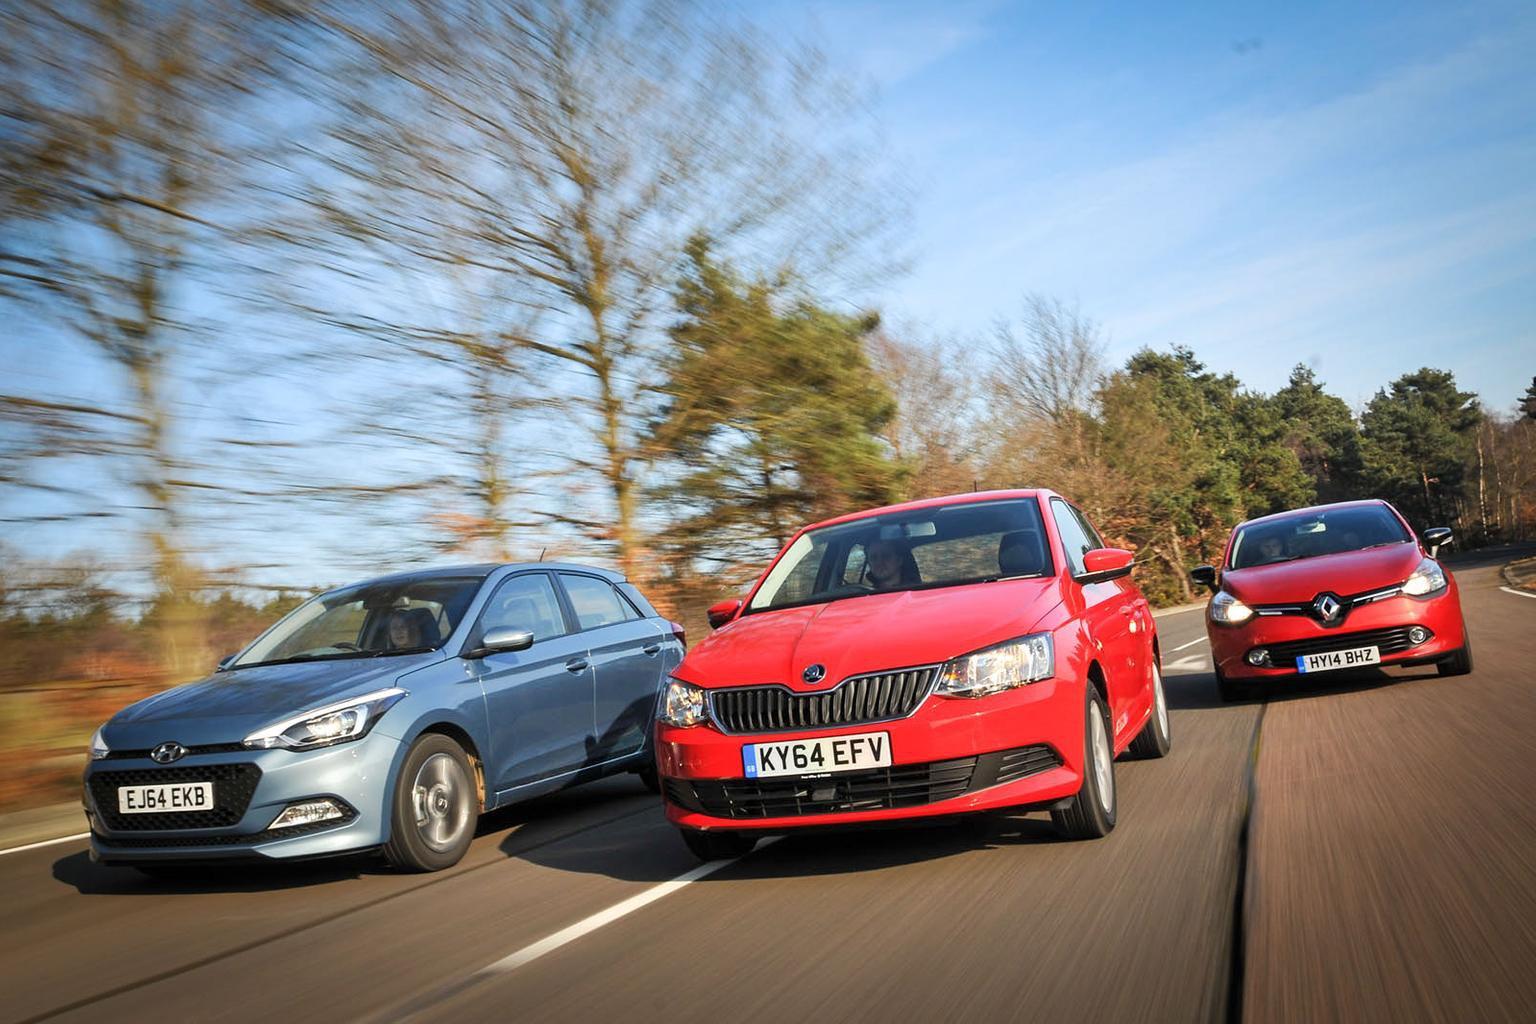 Renault Clio vs Skoda Fabia vs Hyundai i20